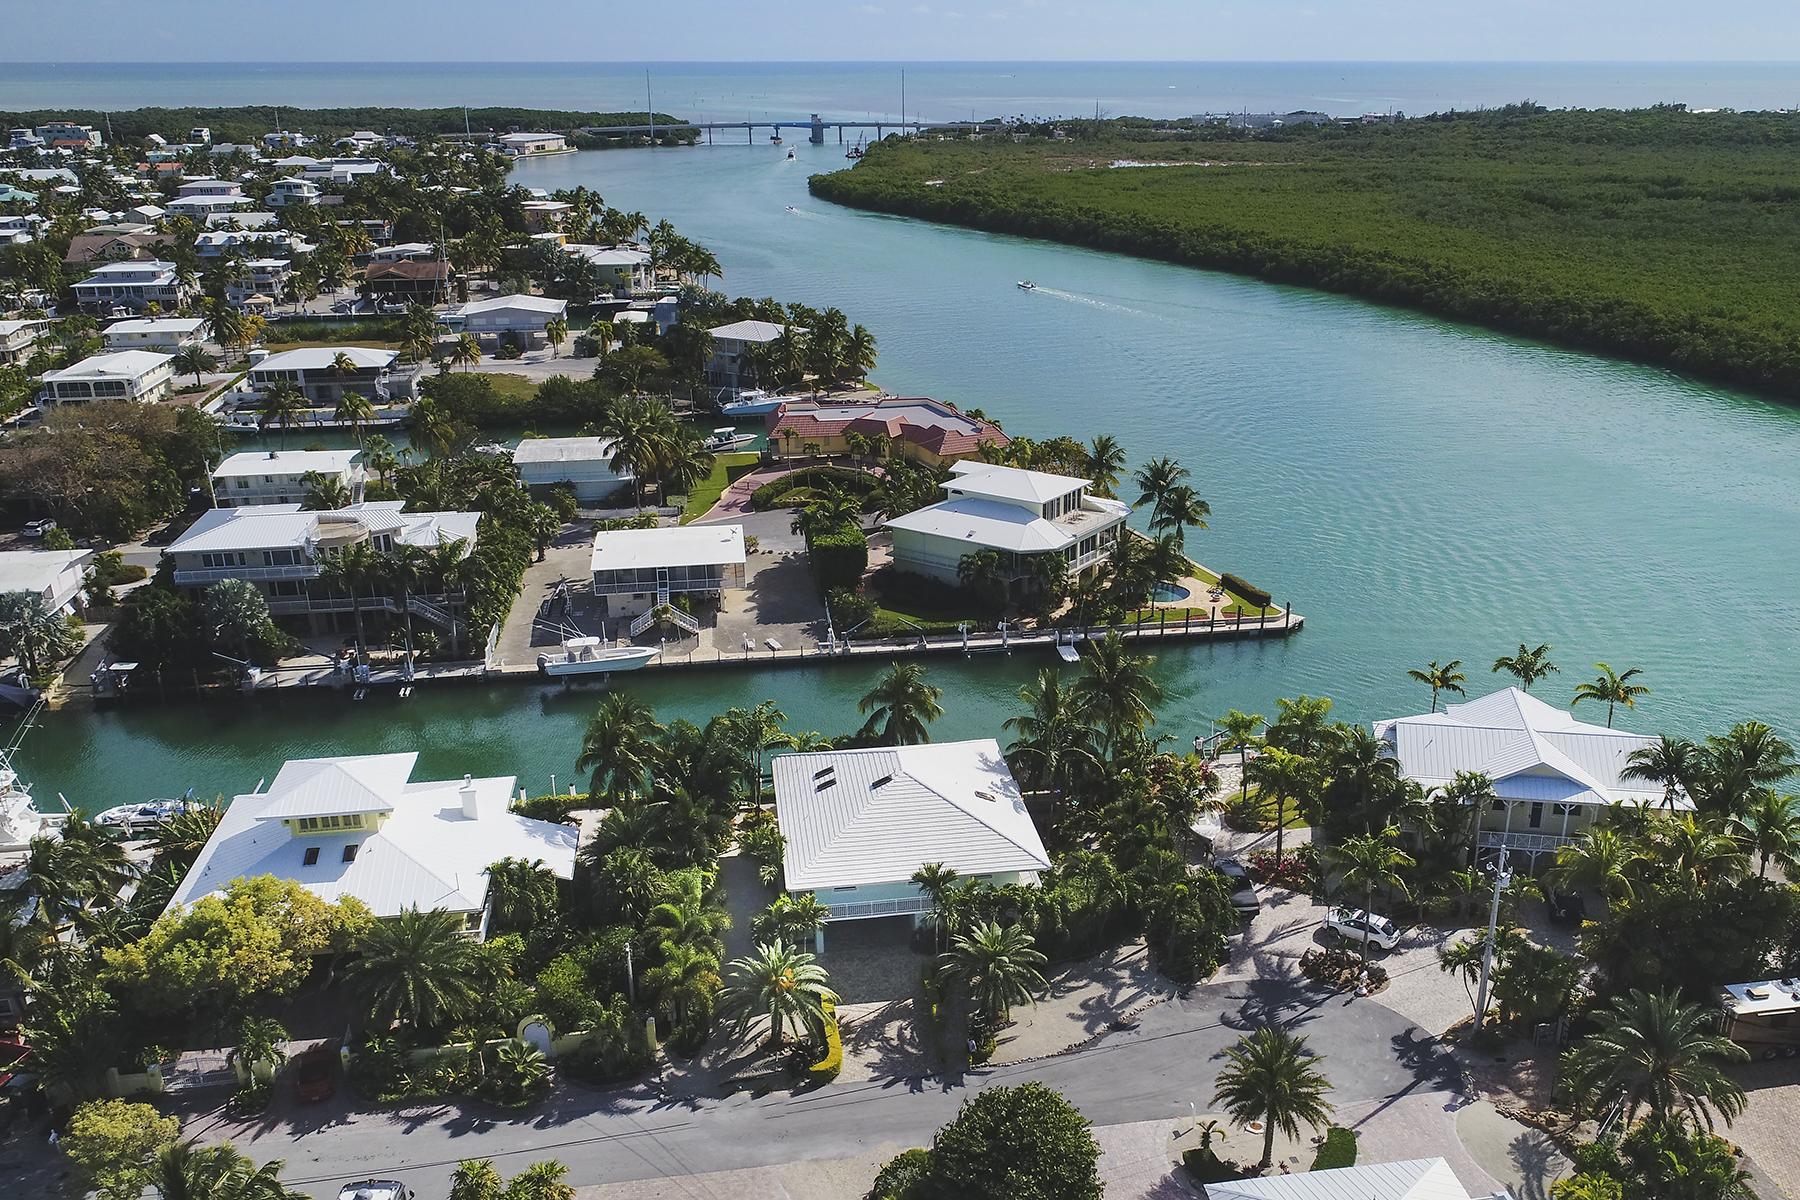 獨棟家庭住宅 為 出售 在 Exclusive Waterfront Location 152 Severino Drive Florida Keys, Islamorada, 佛羅里達州, 33036 美國